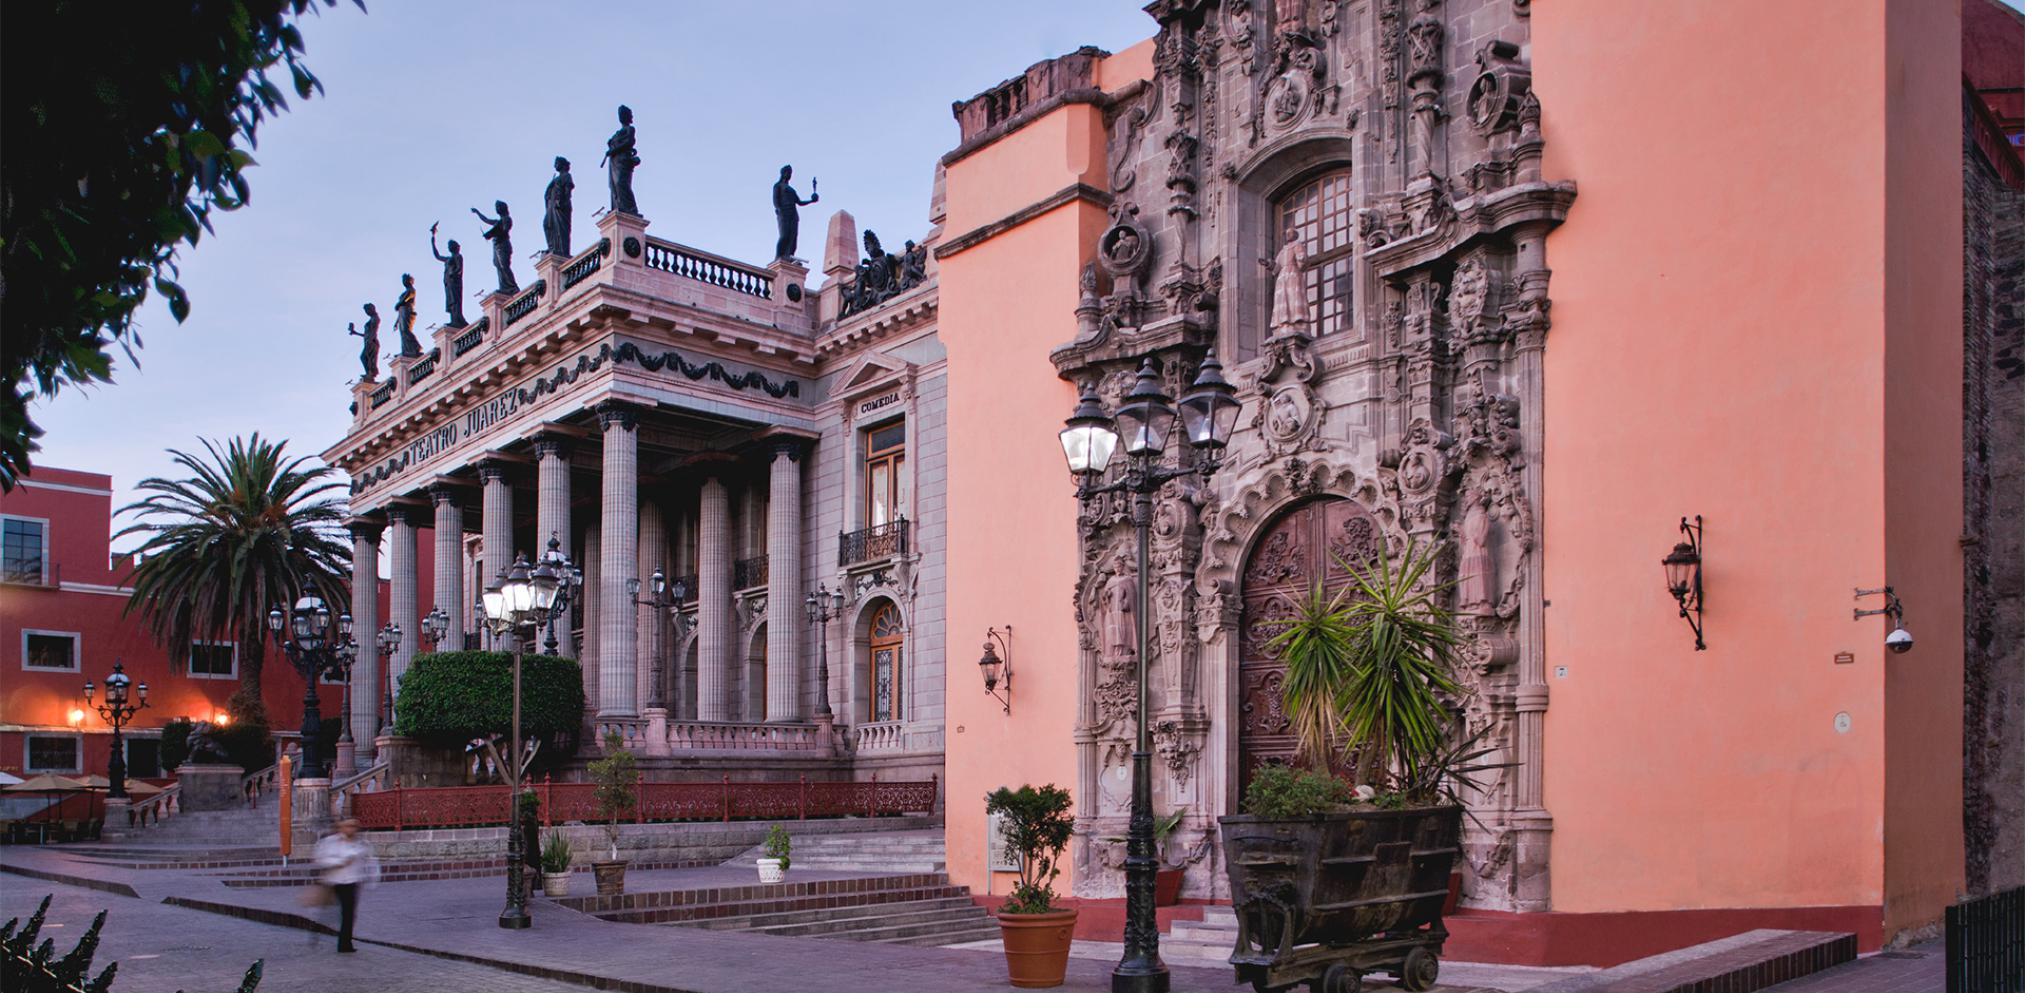 Visita Guanajuato, Guanajuato